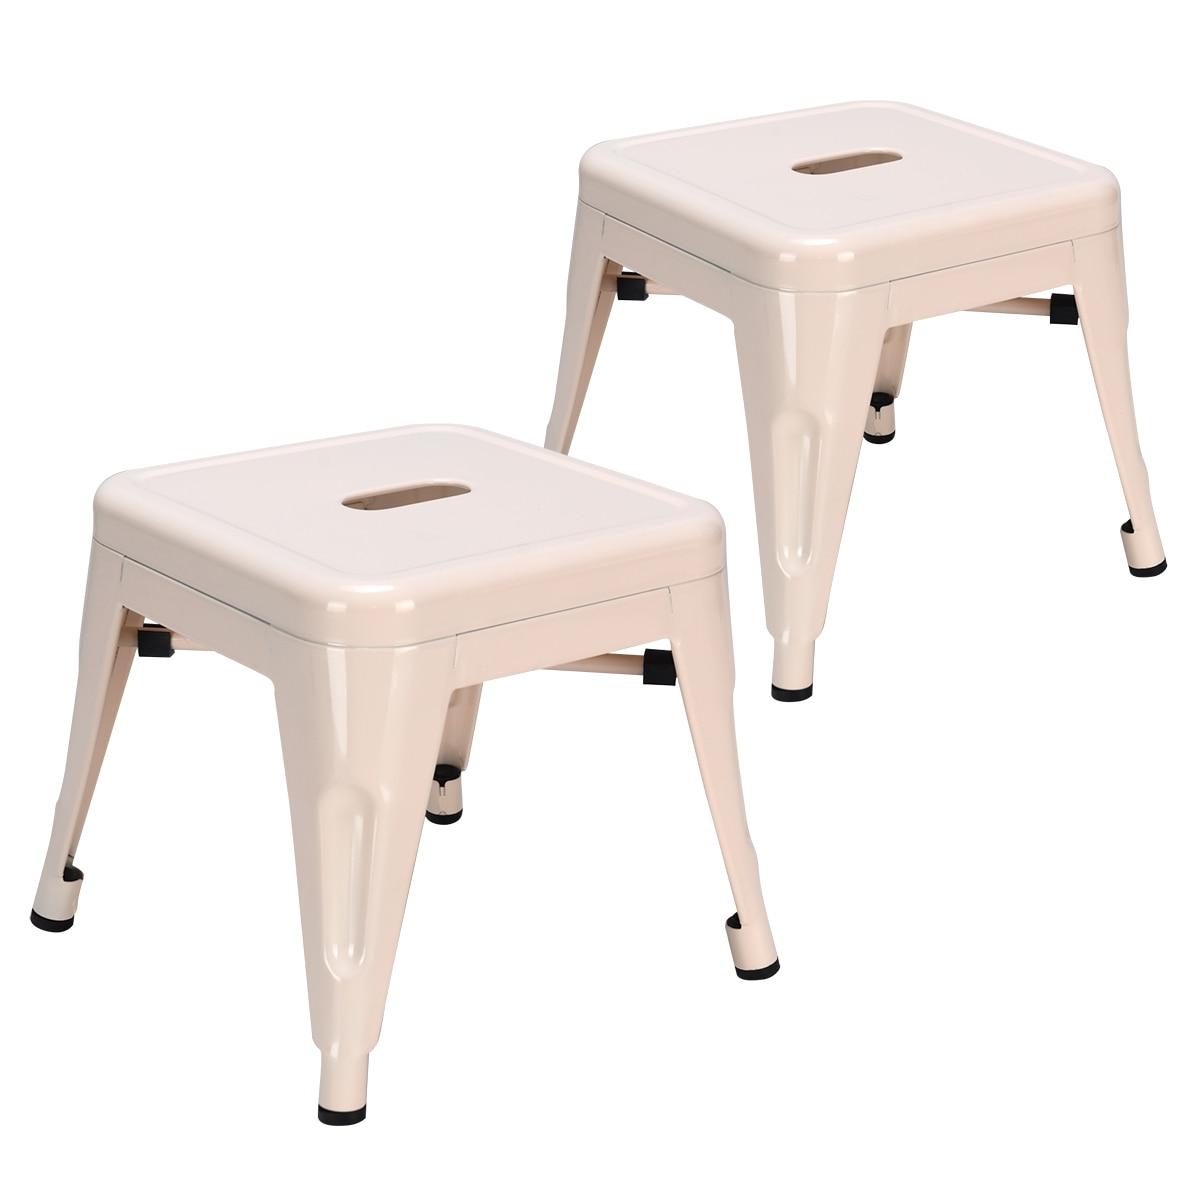 Set Of 2 Kids Toddler Children Stackable  Metal Chair Stool Lightweight White